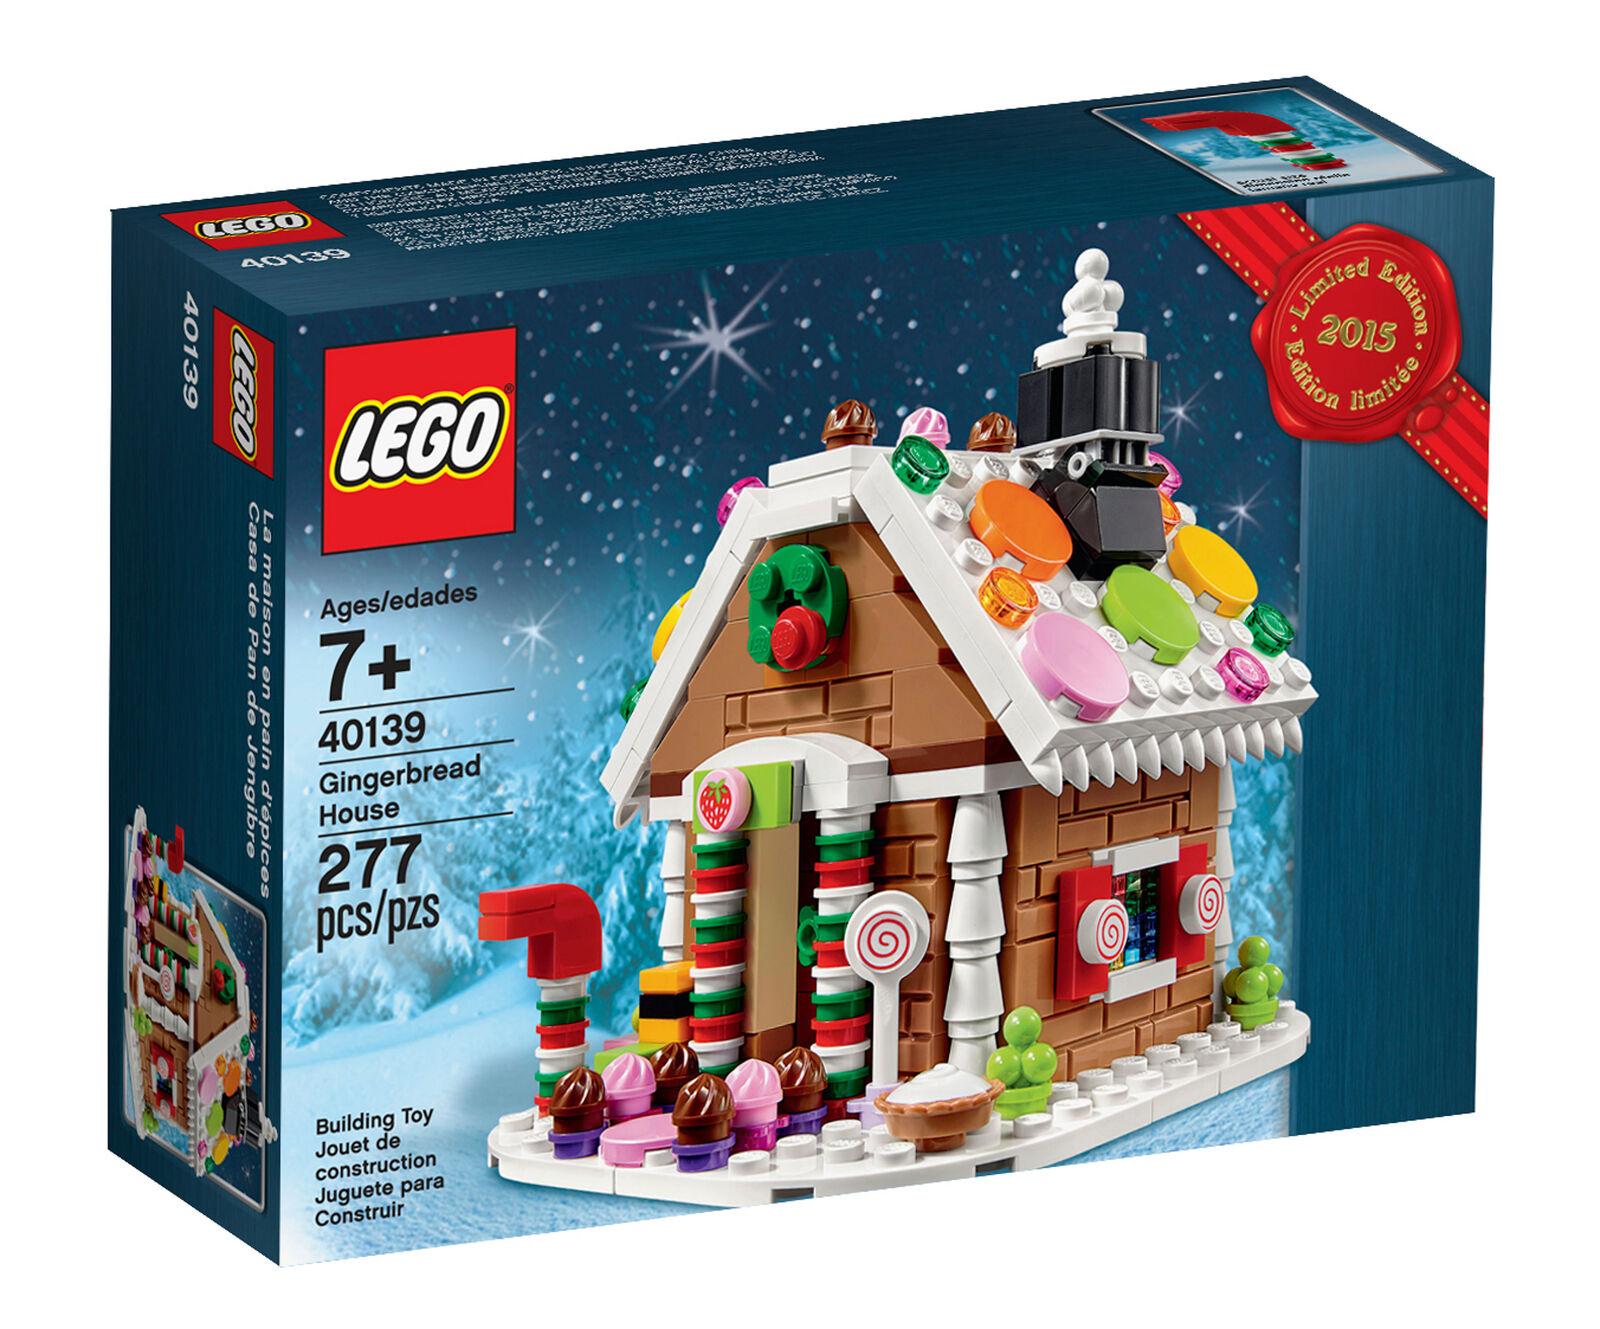 LEGO LEGO LEGO 2015 Holiday Gingerbread House (40139) d75ad1